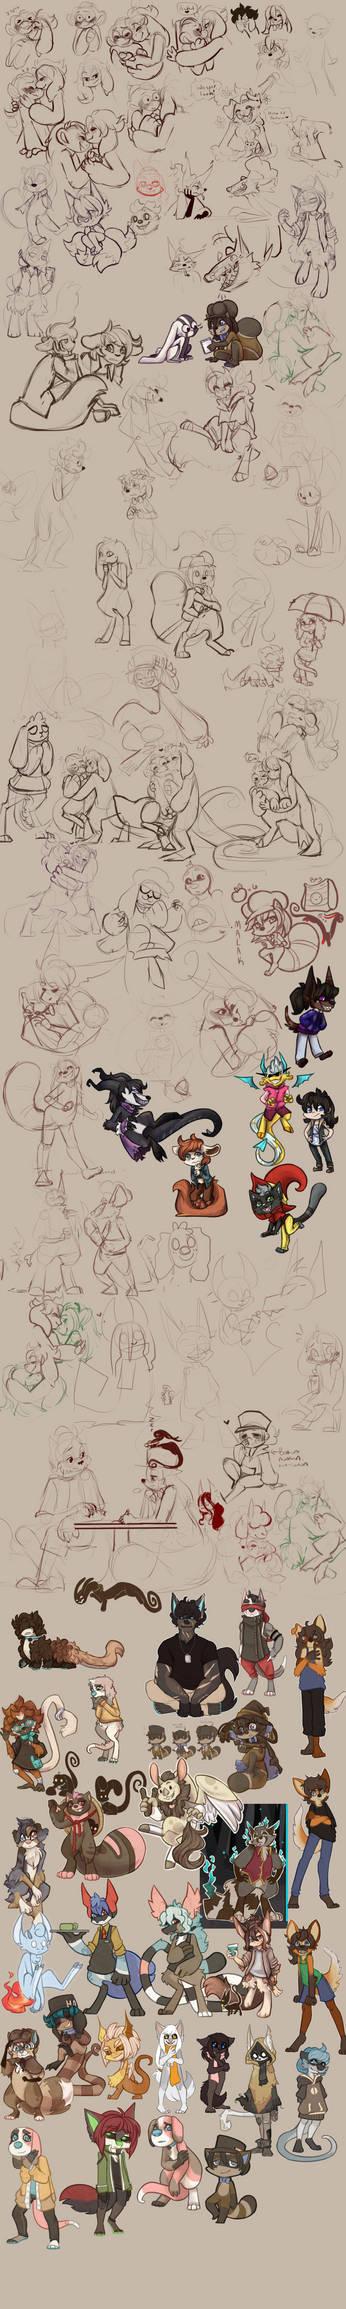 CC Sketches 4